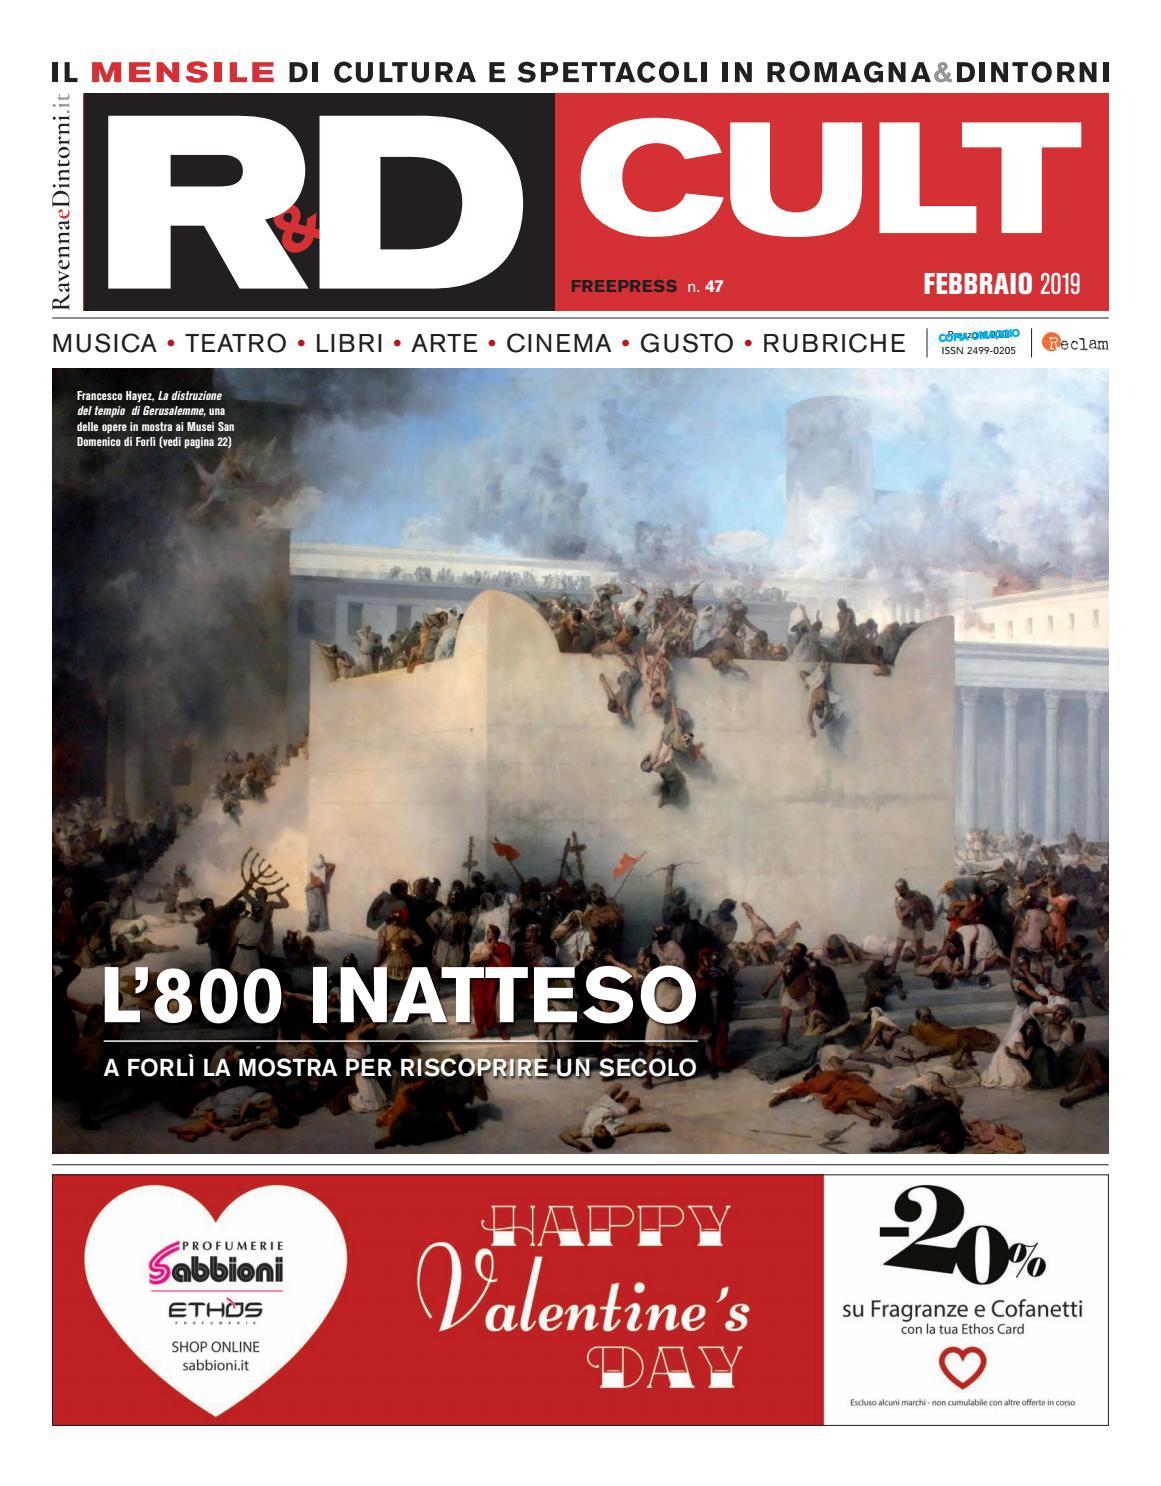 00e87d117b R&D CULT febbraio 2019 by Reclam Edizioni e Comunicazione - issuu